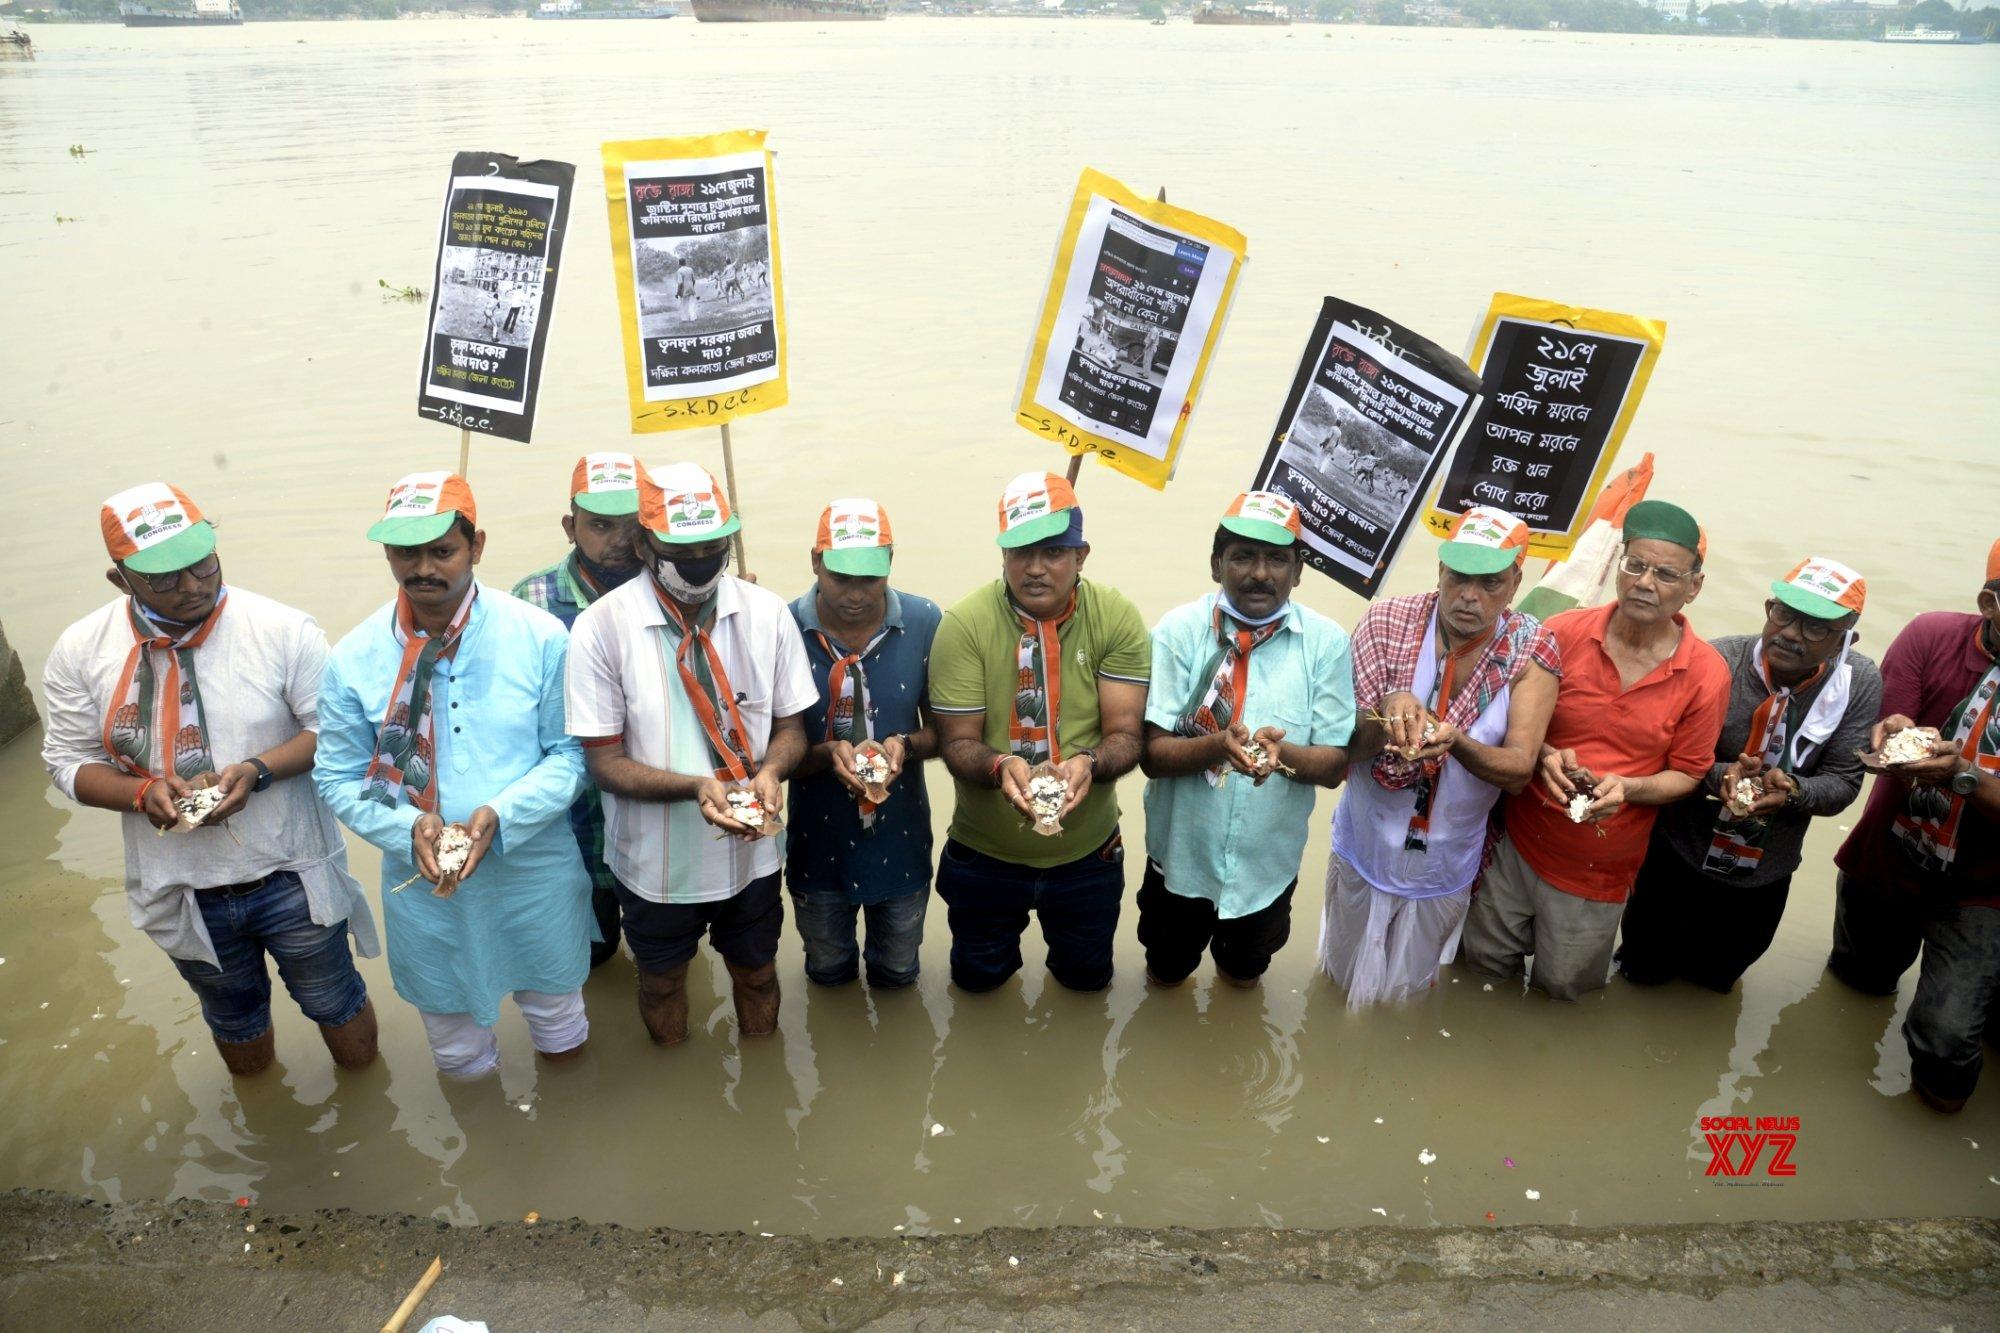 Kolkata: Youth Congress activists perform Tarpan ritual at River Ganga ghat in memory of youth Congress activists killed during July 21, 1993 protest rally in Kolkata #Gallery